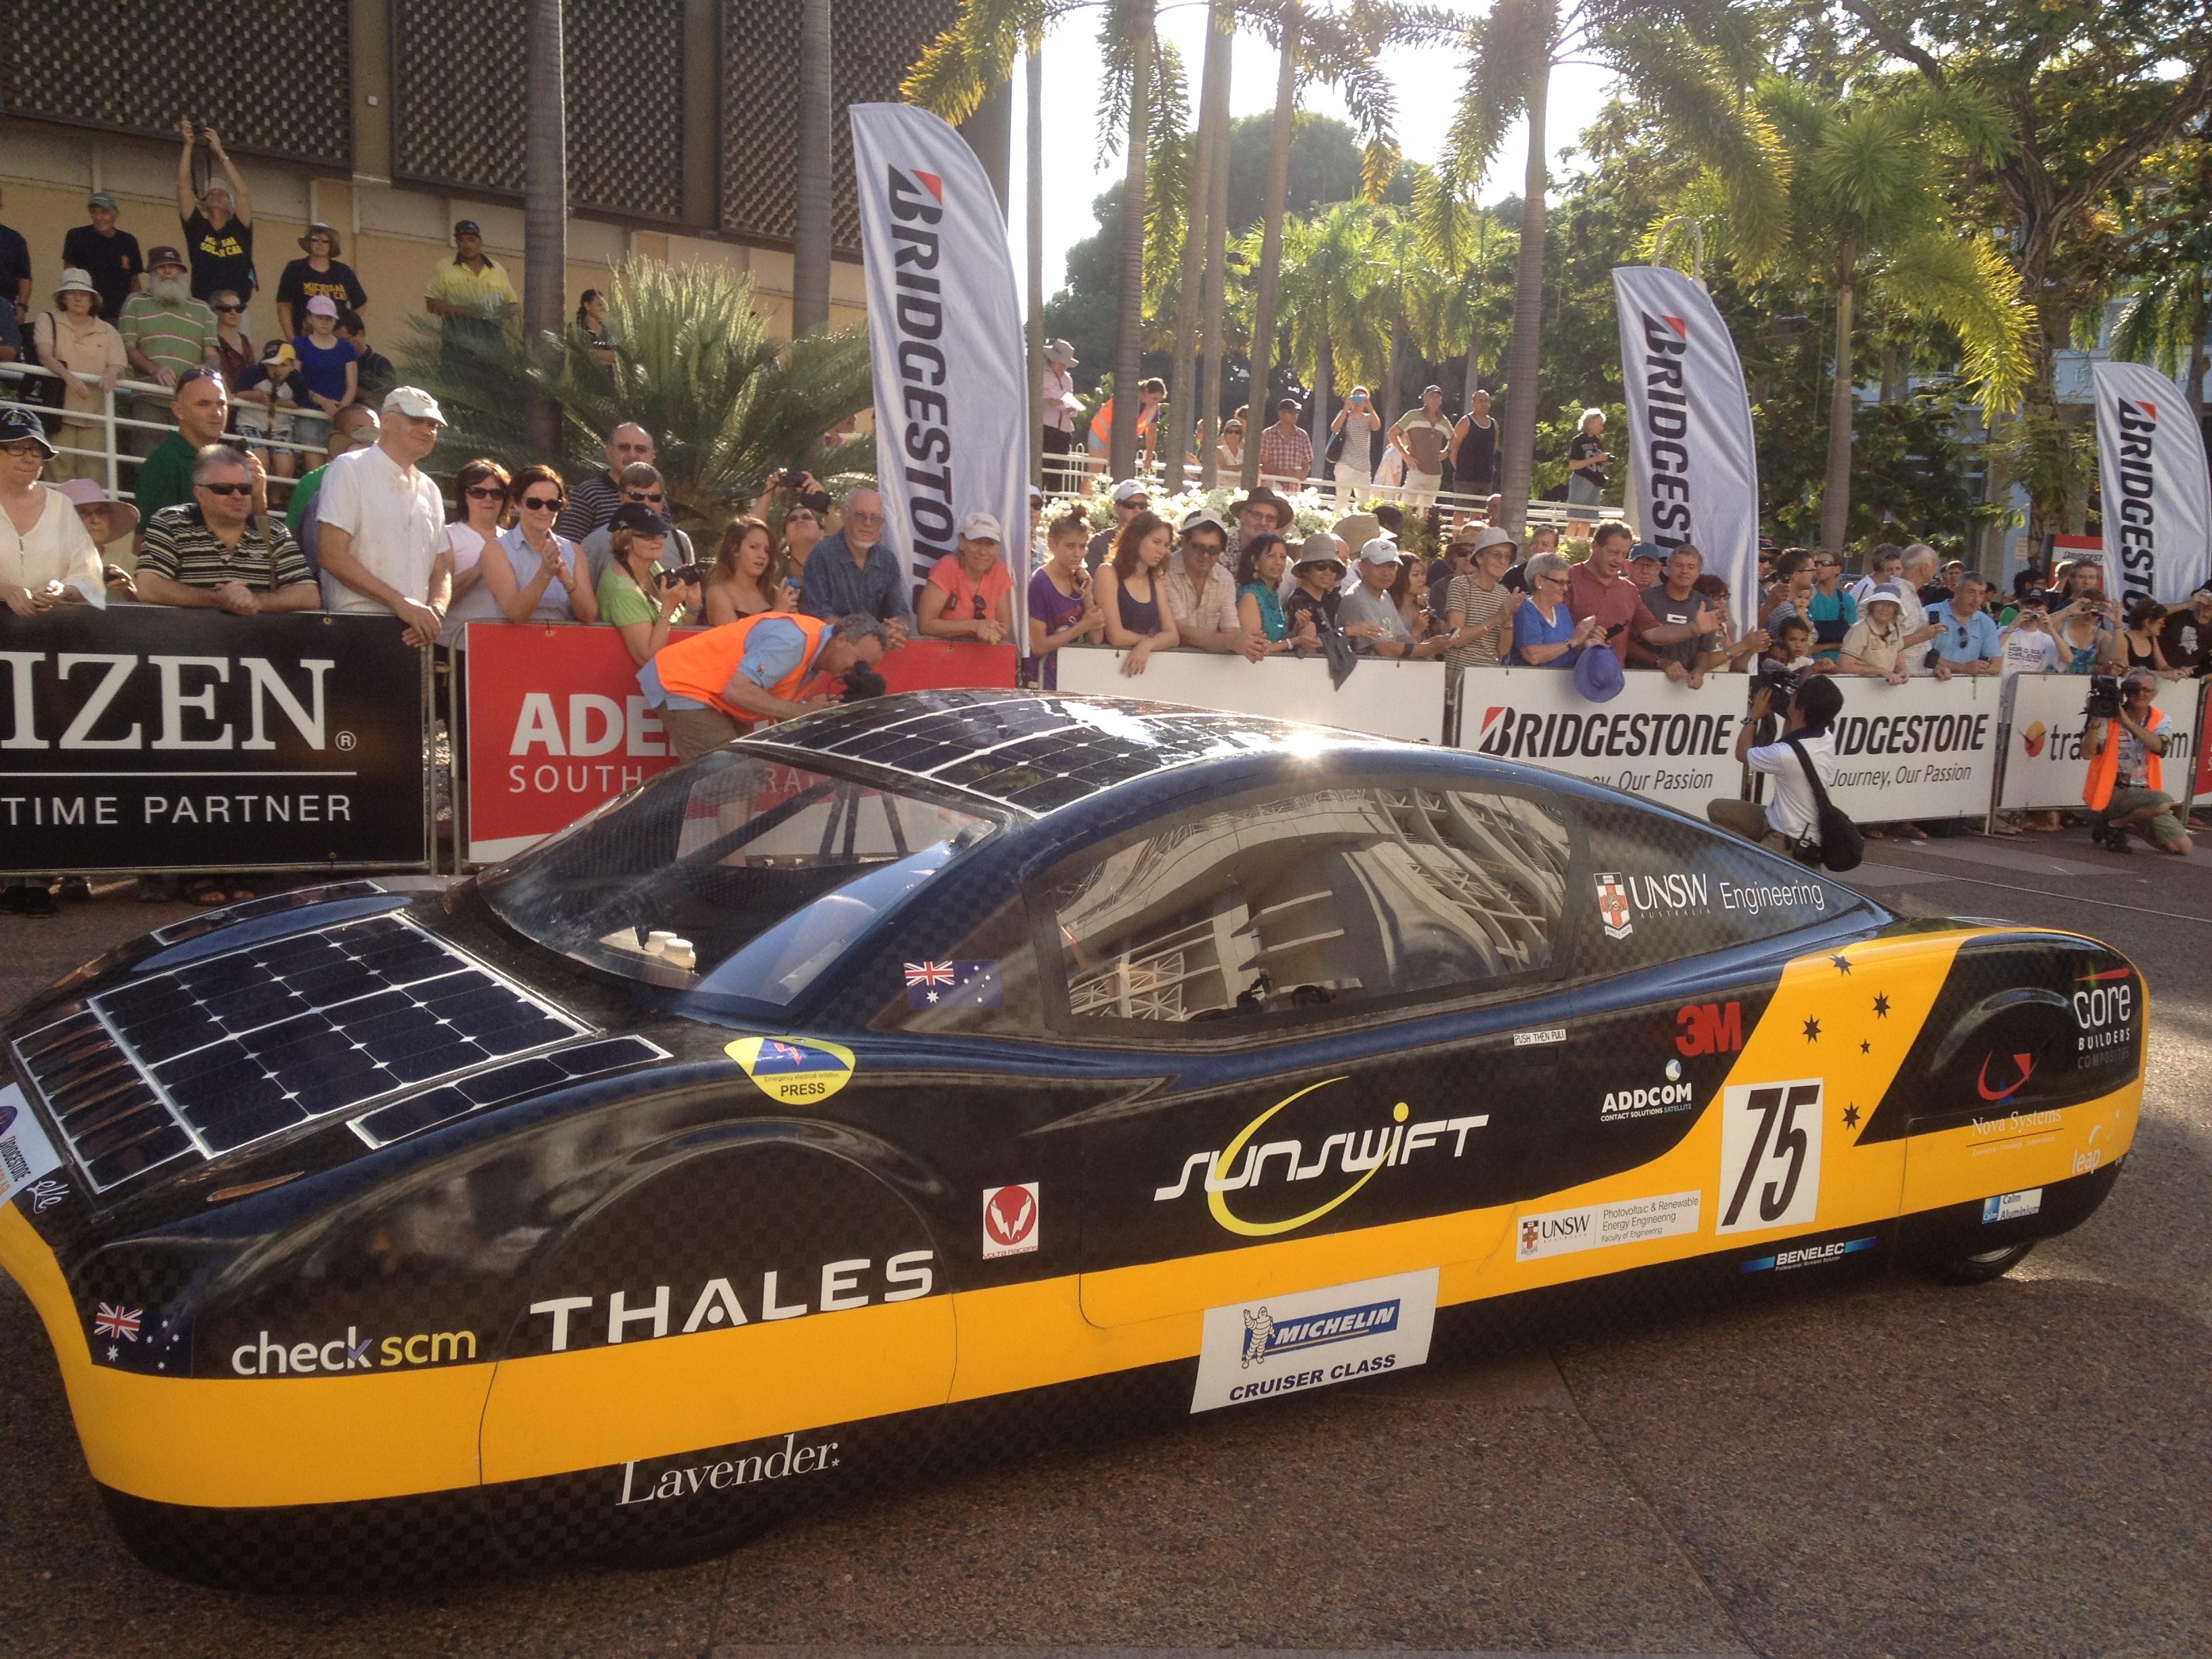 WSC2013-University of NSW (Ausstralia)'s UNSW Solar Racing Team-SUNSWIFT